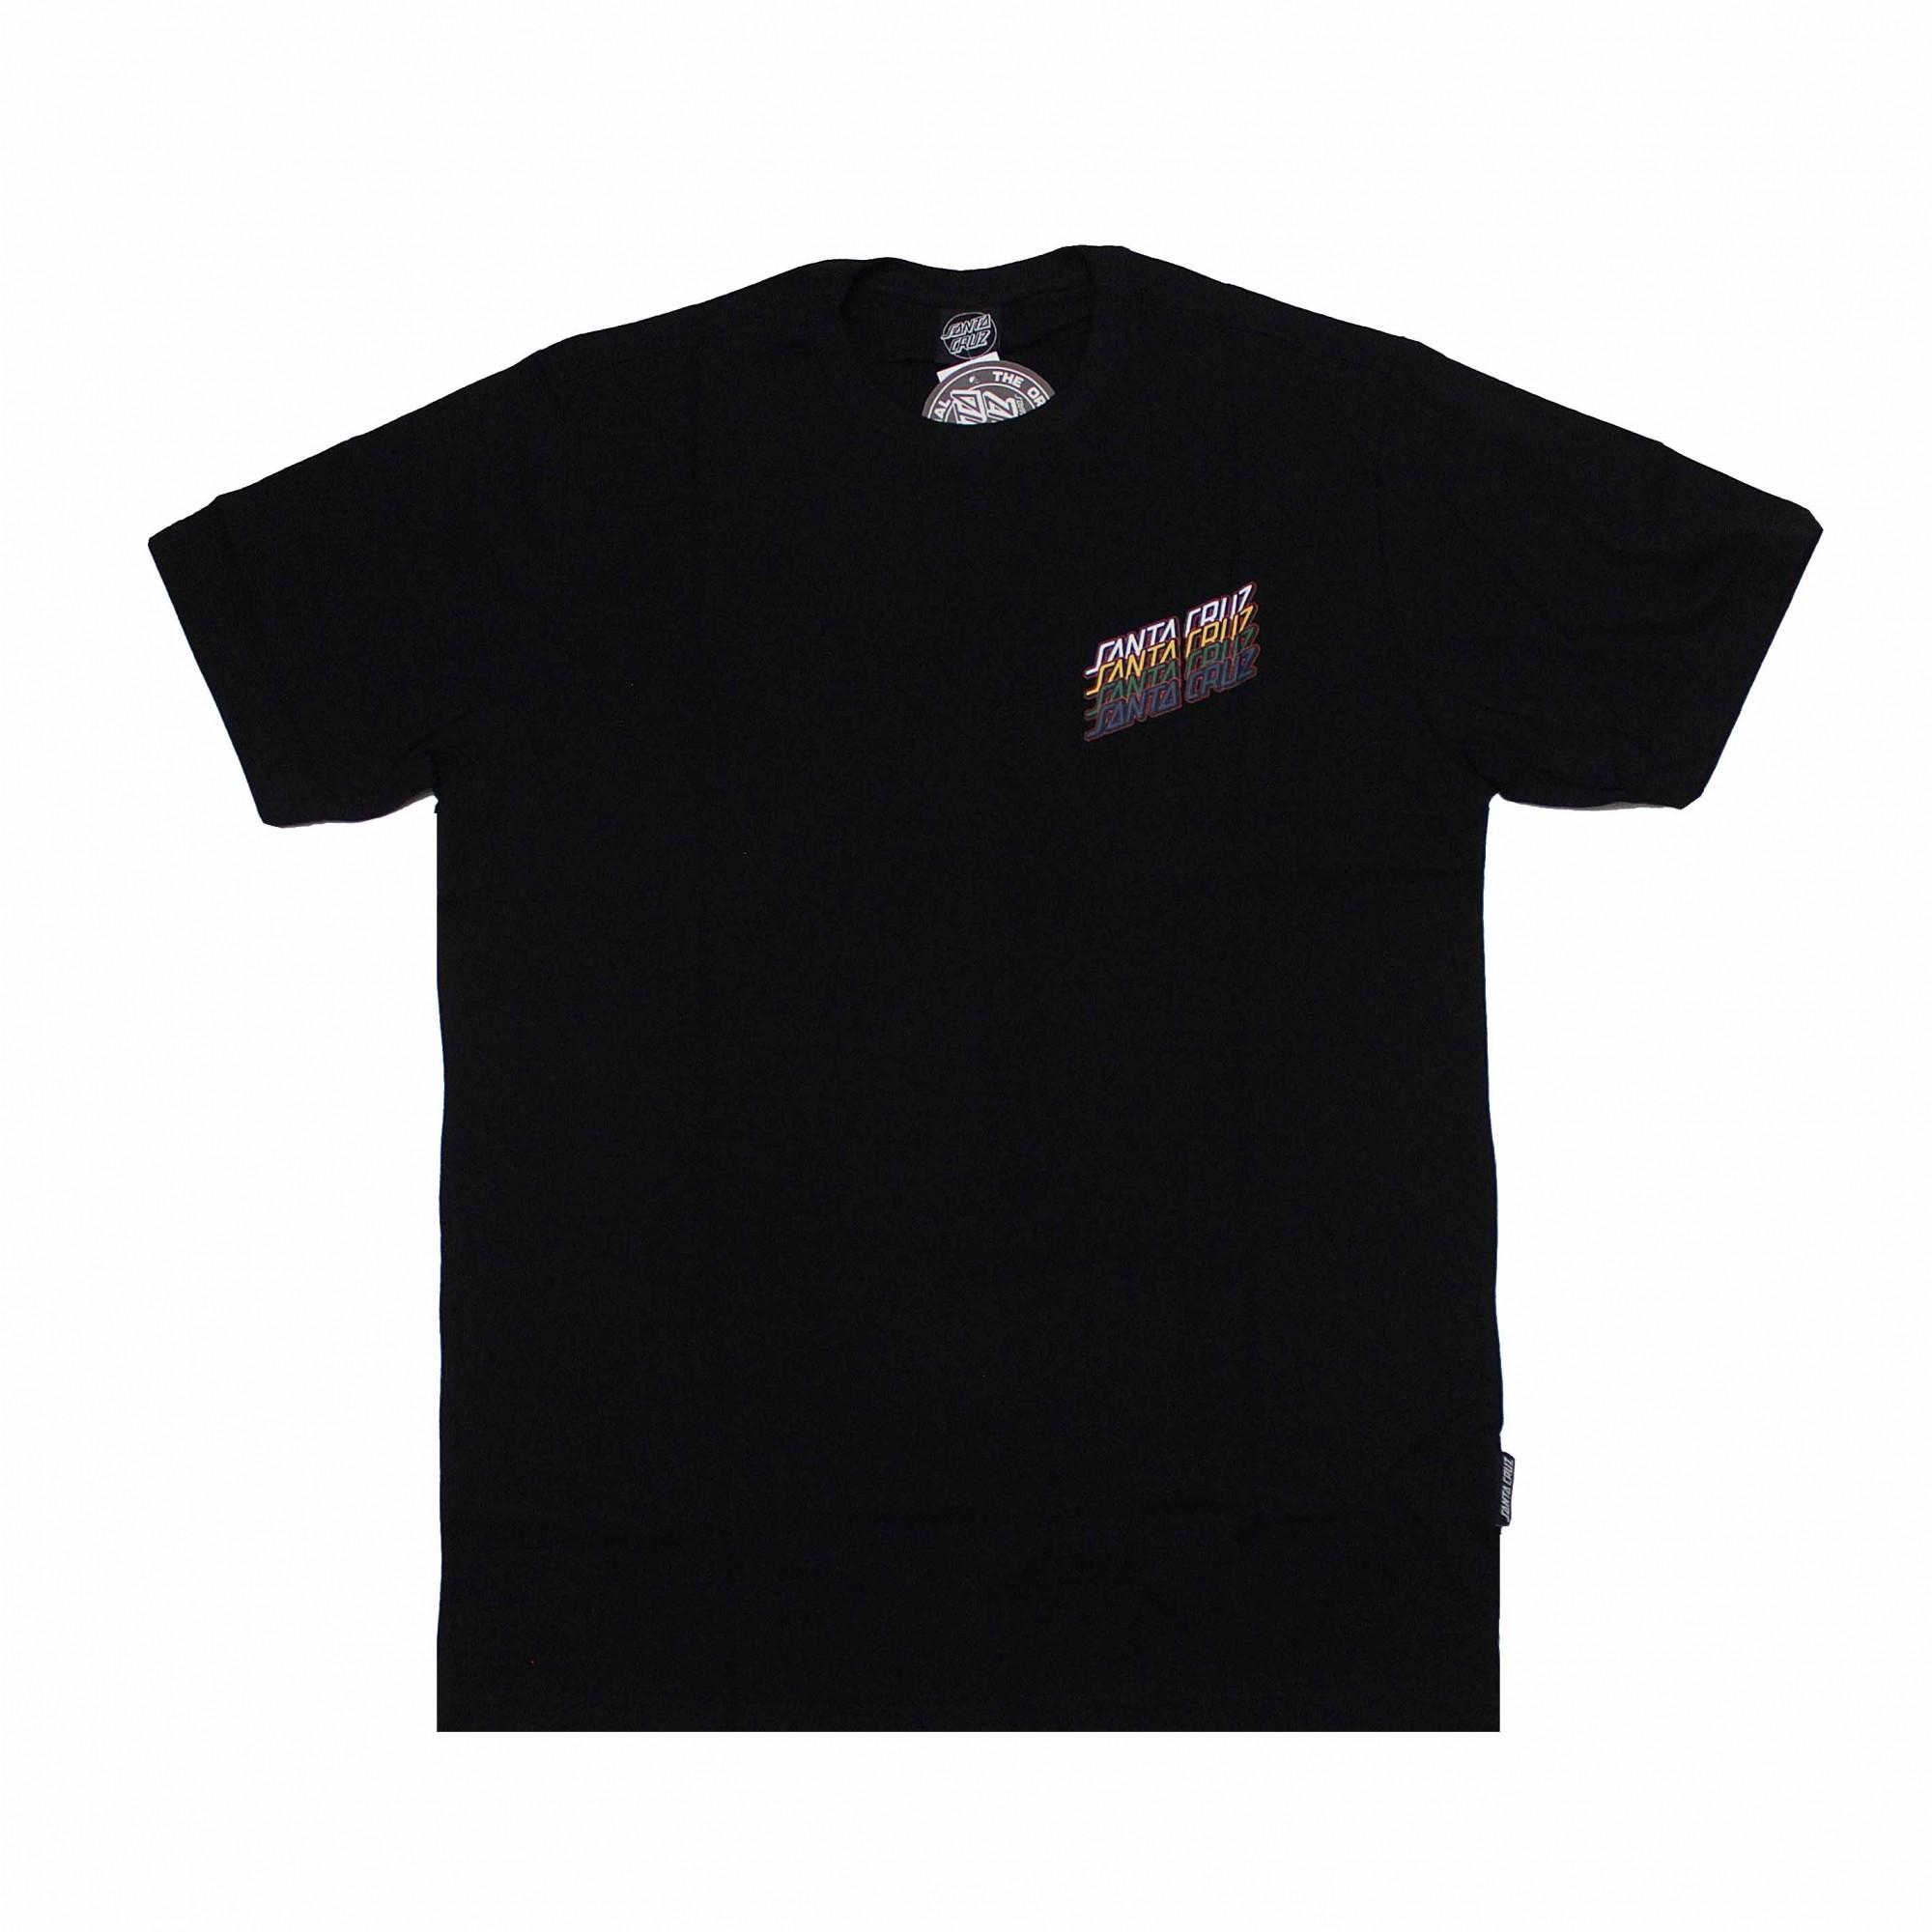 Camiseta Santa Cruz Multi Strip - Preto